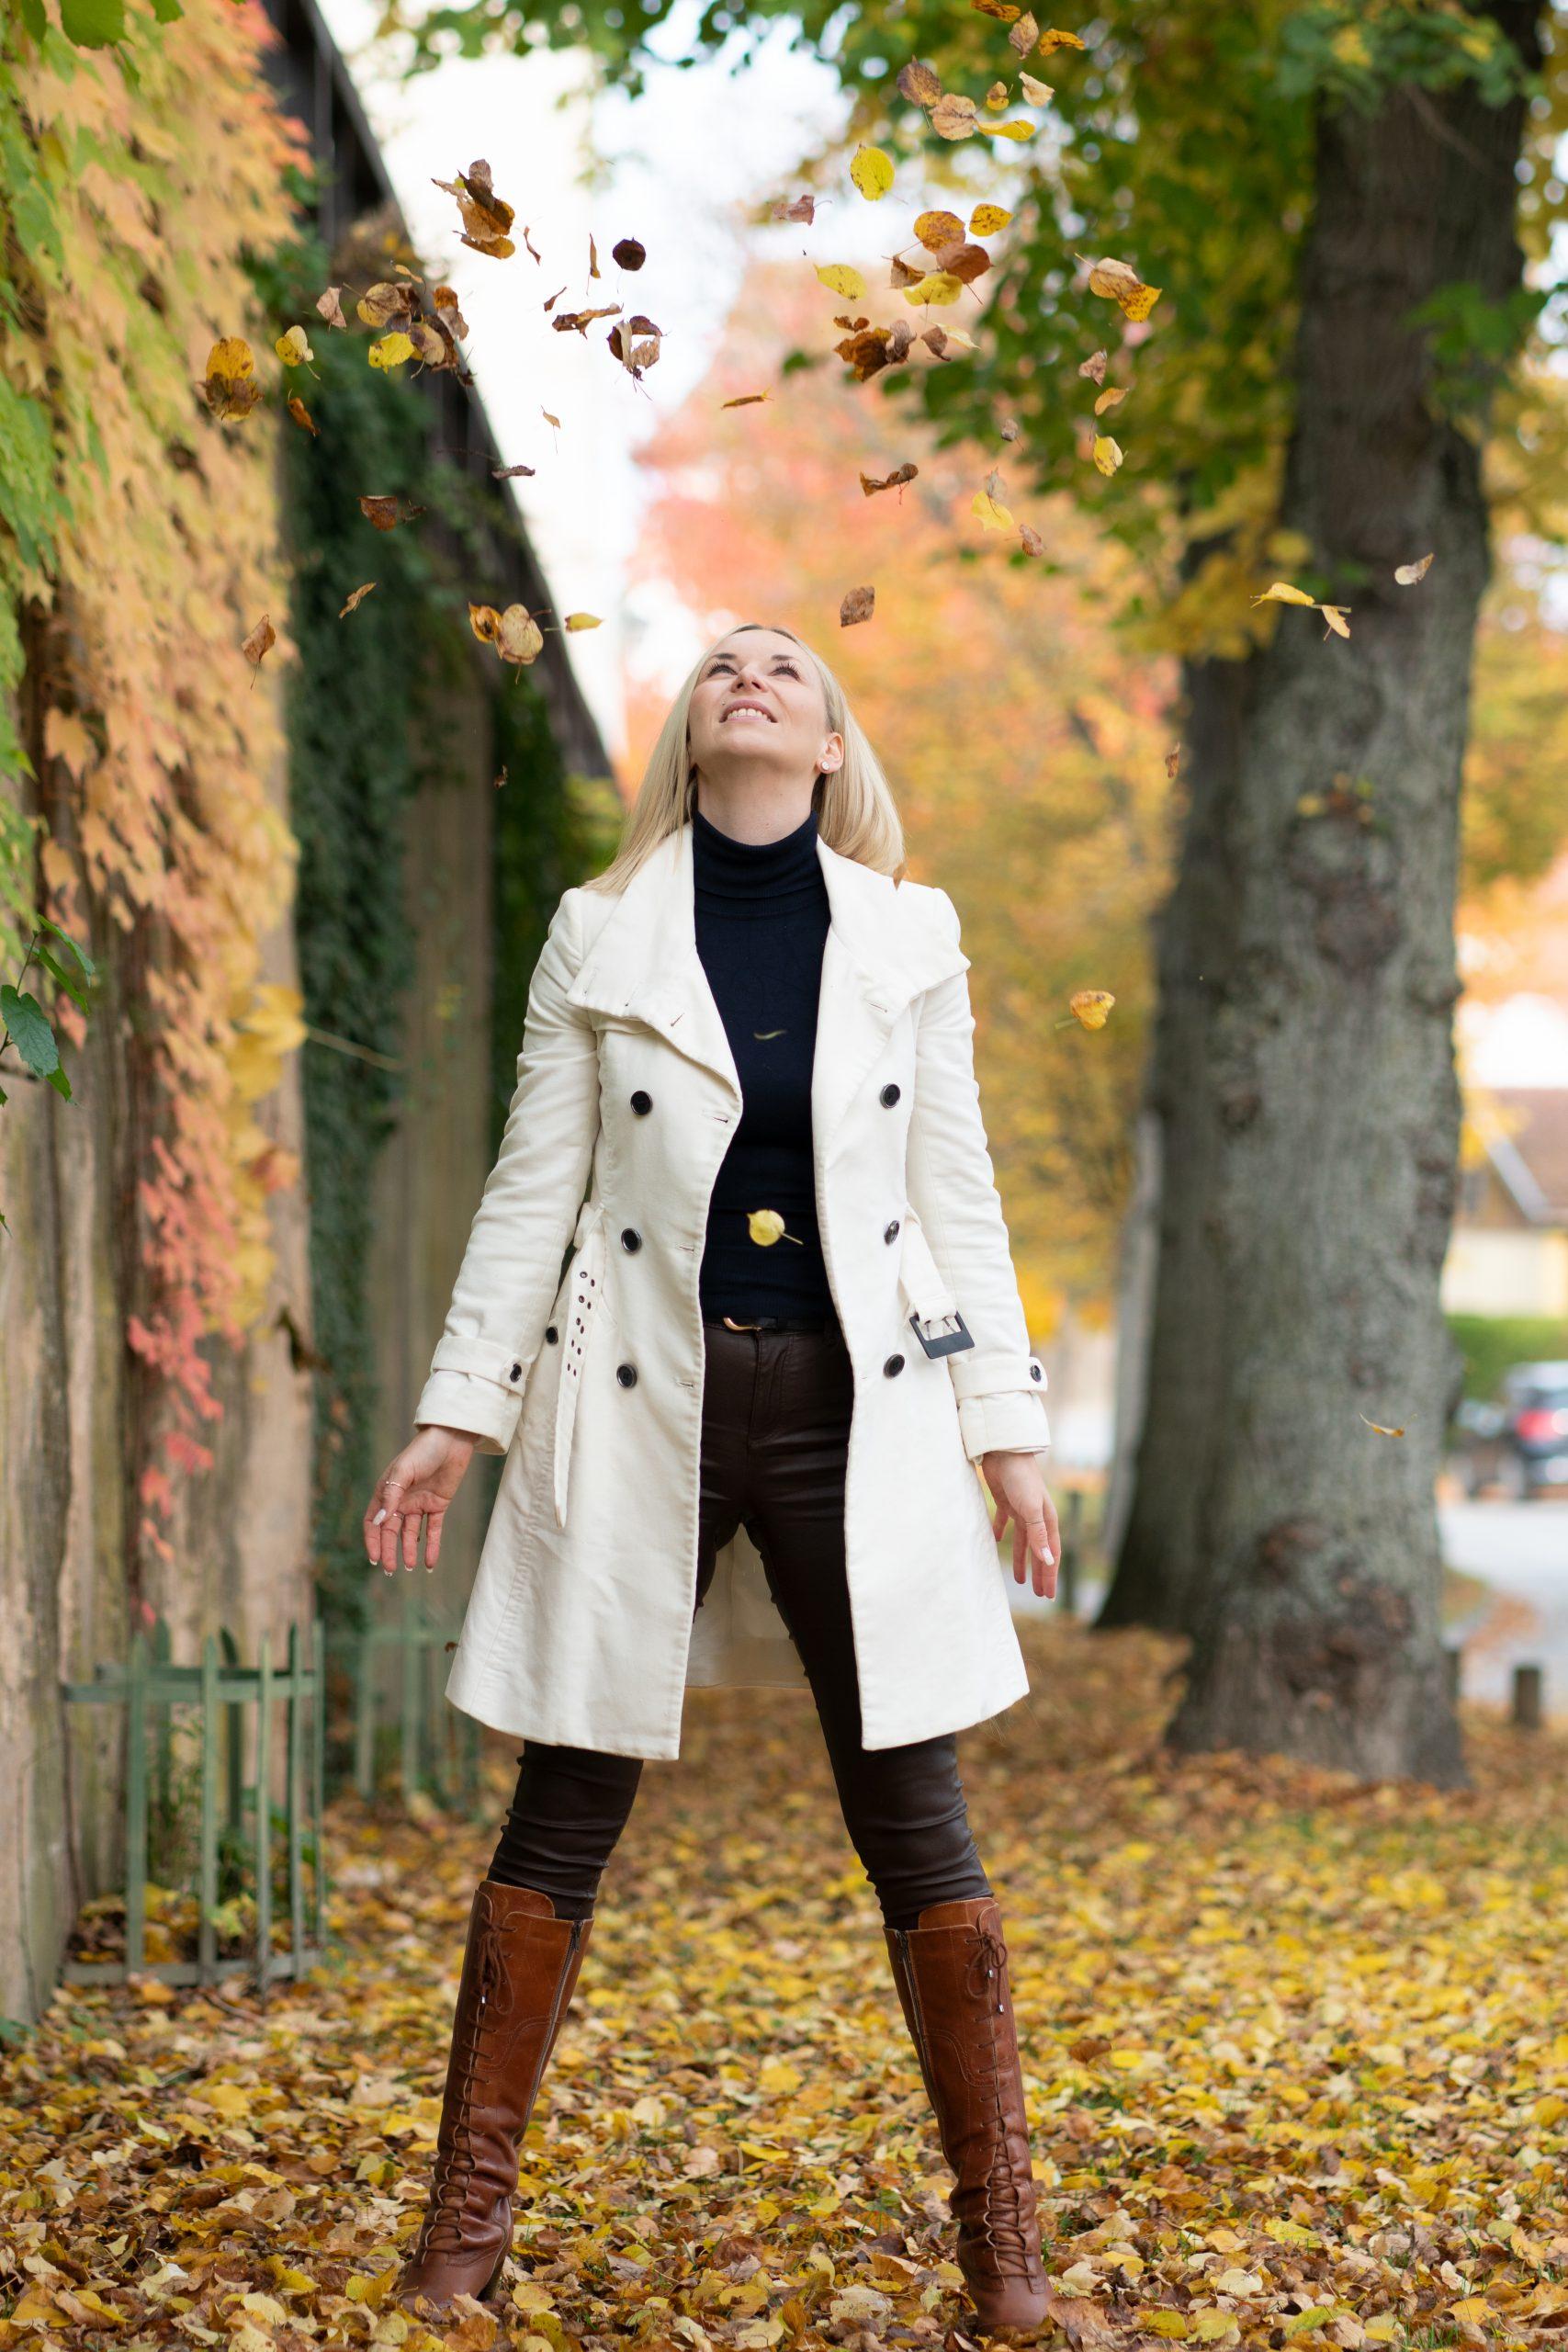 franziska_schneider_fotografie_portrait_14